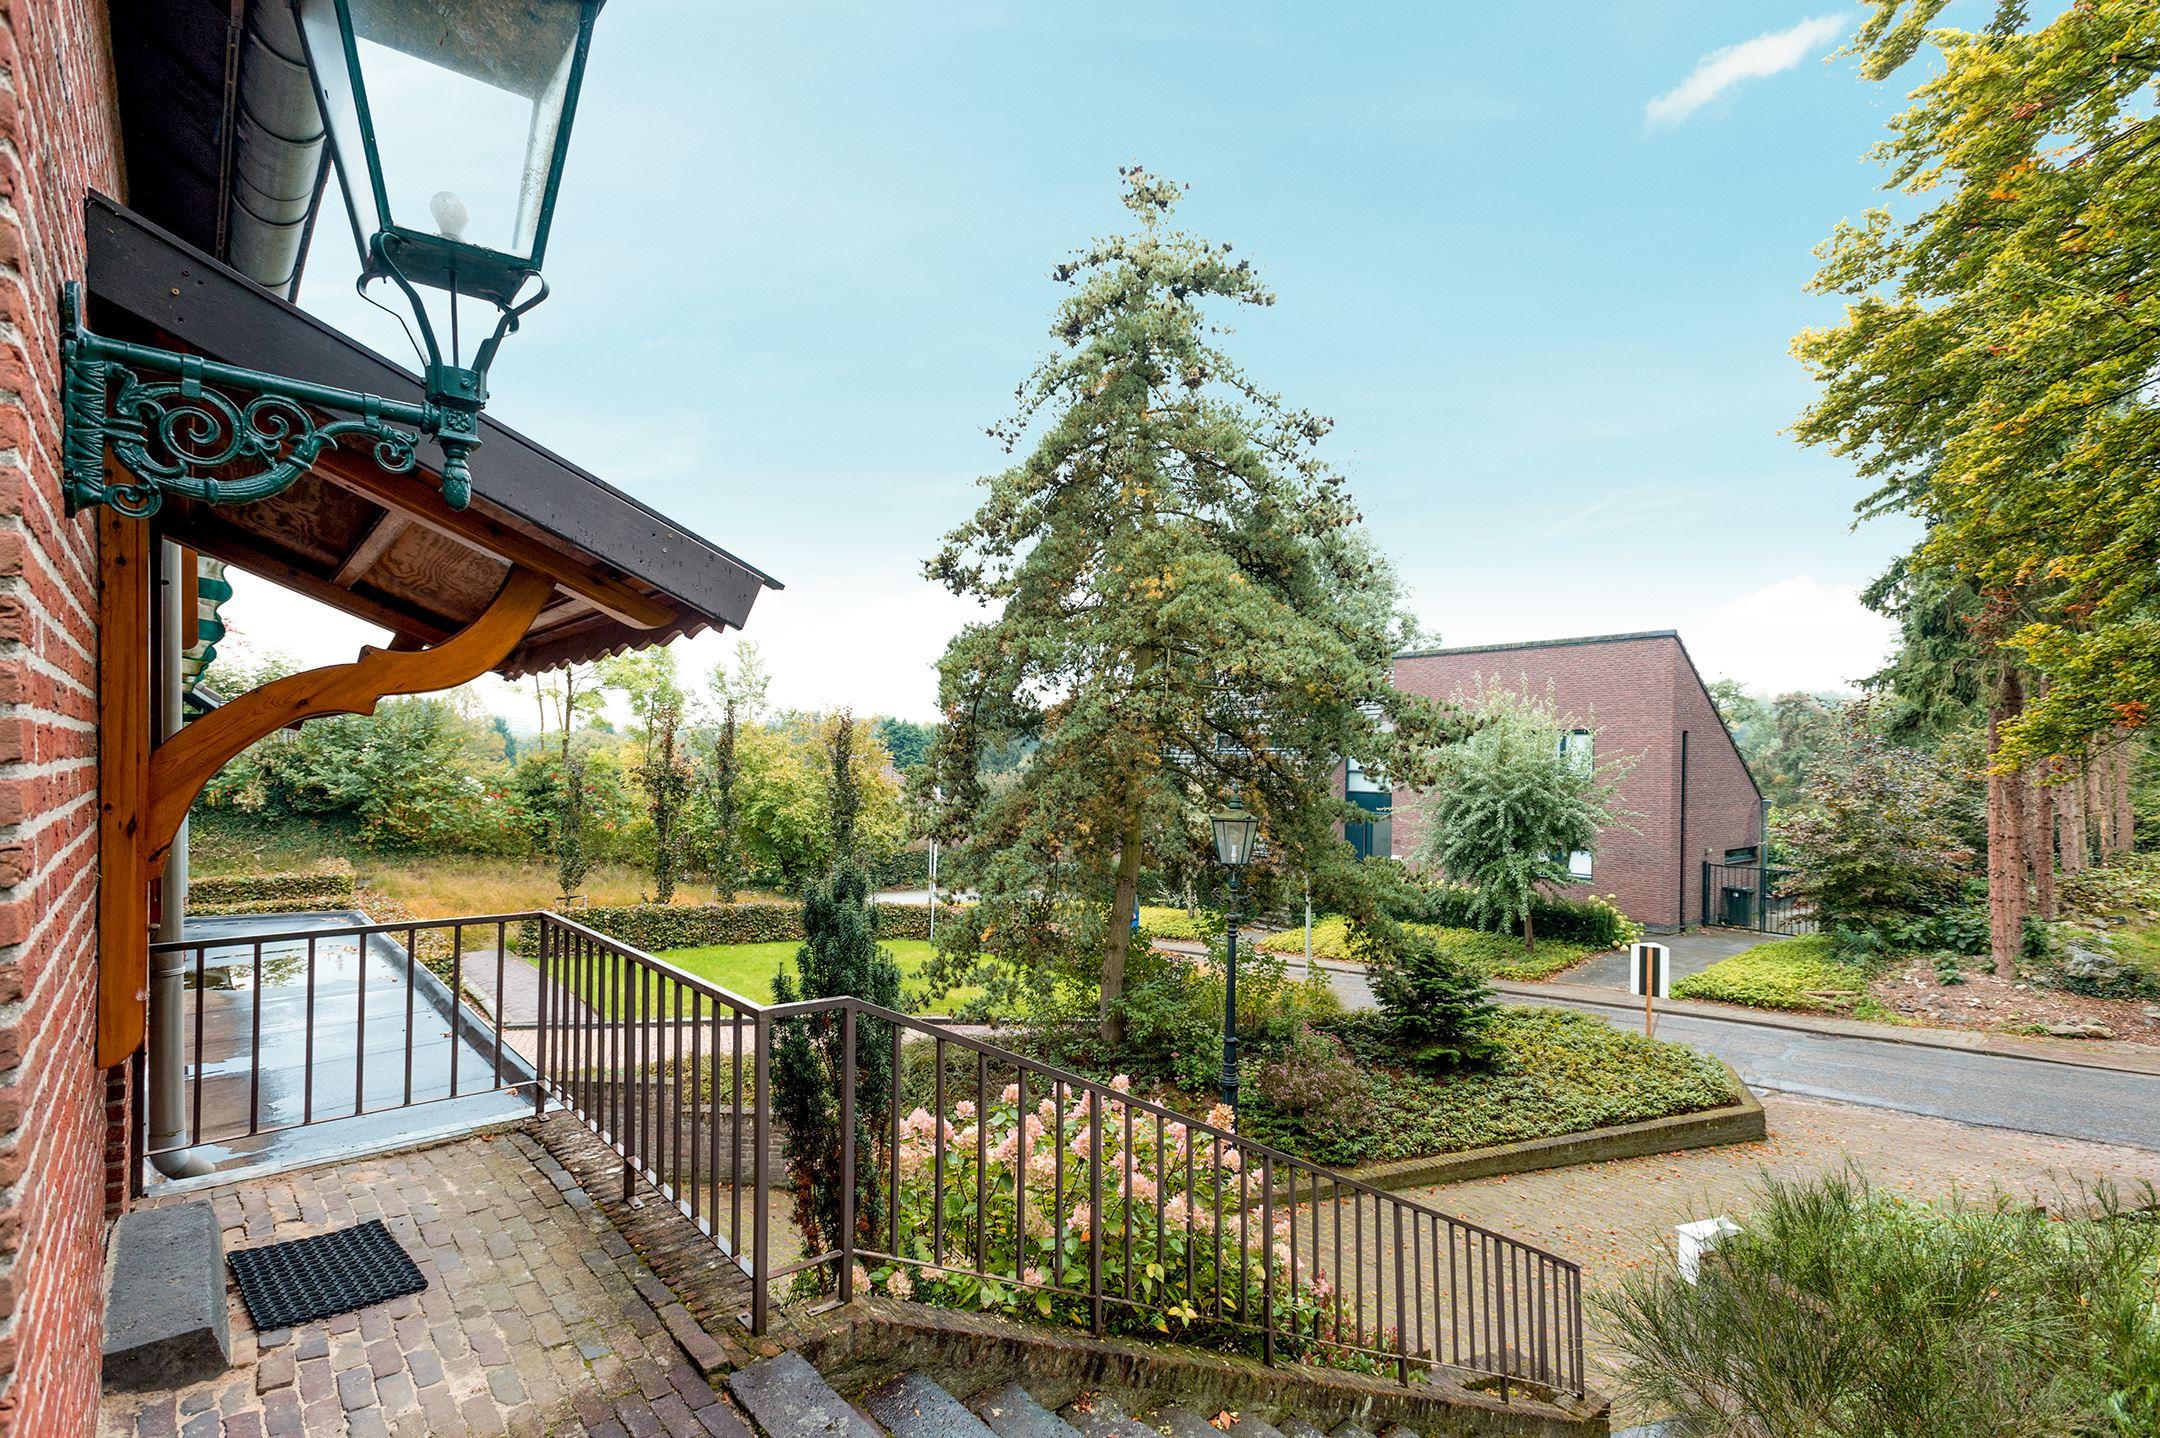 Huis te koop wilmenweg 29 6447 aw merkelbeek funda for M2 trap berekenen